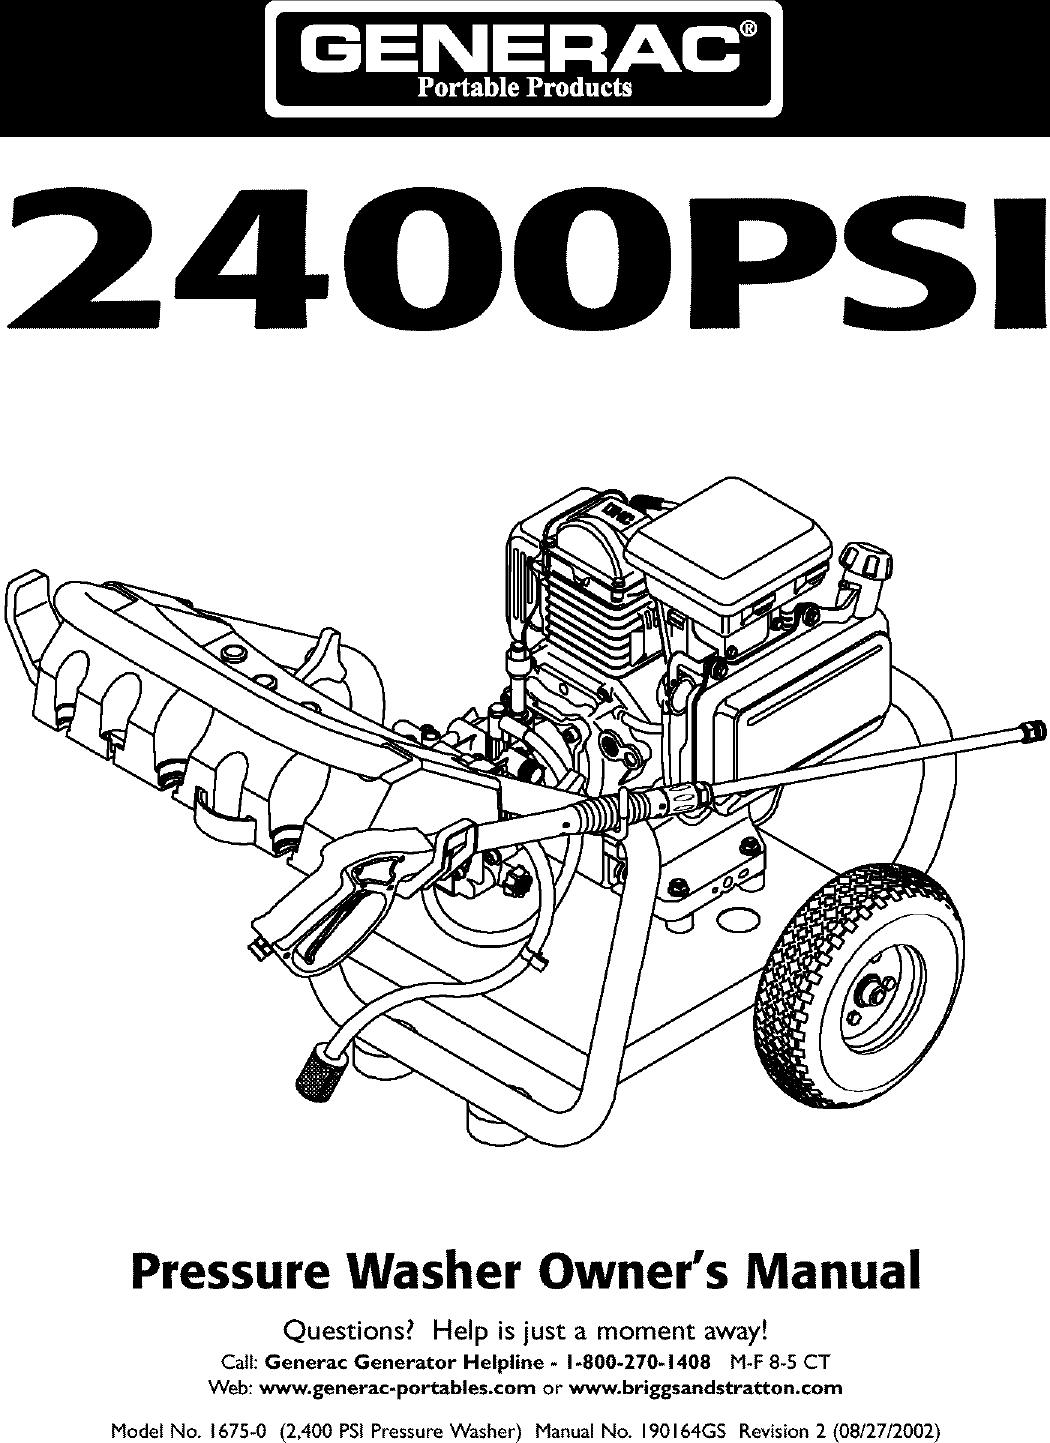 Generac 1675 0 User Manual PRESSURE WASHER Manuals And